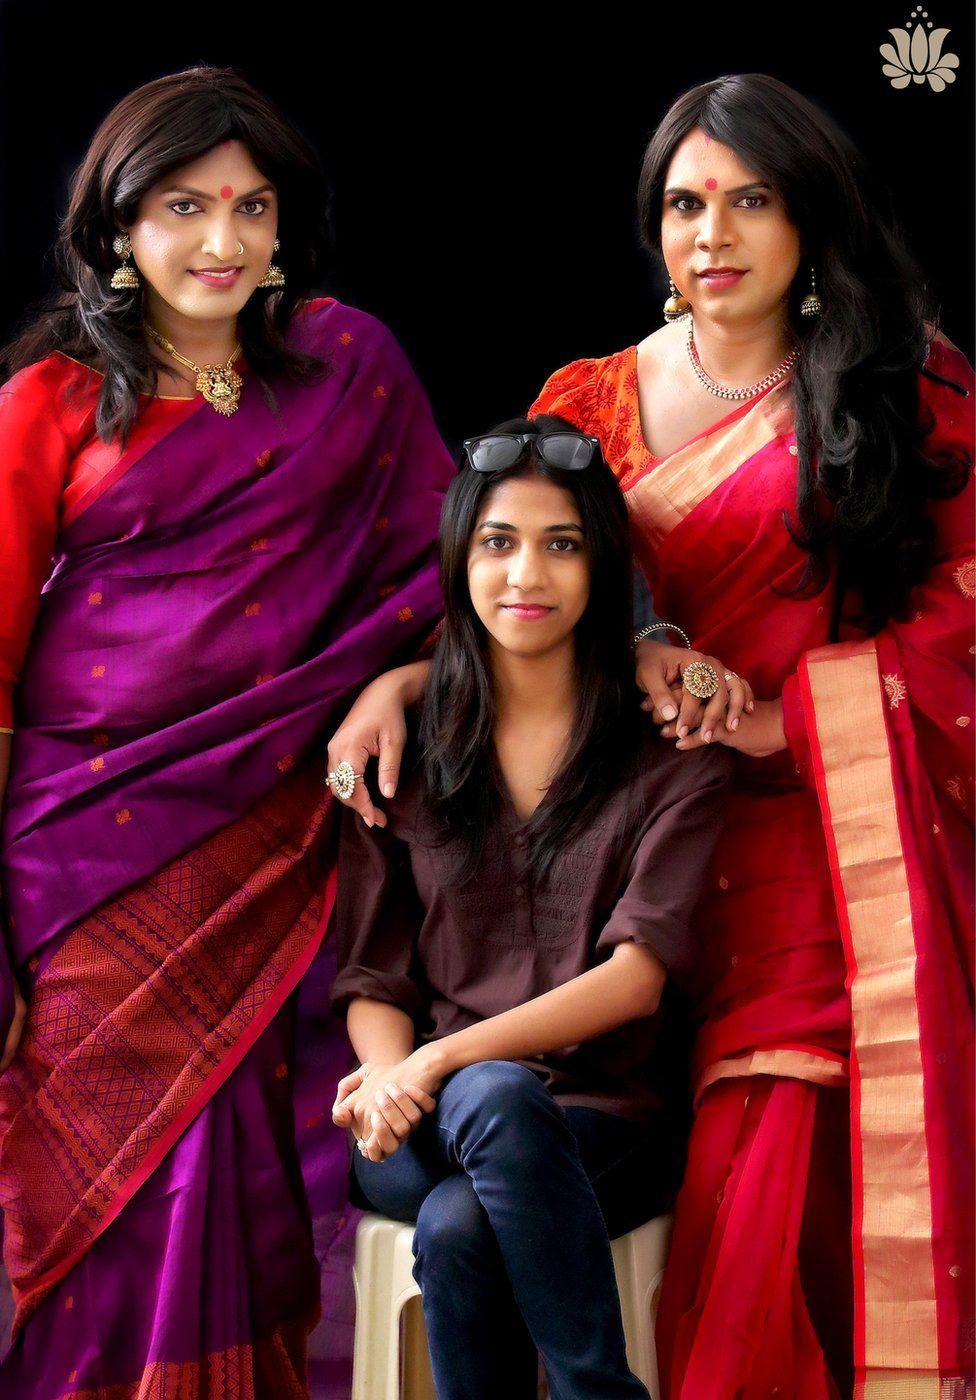 Designer Sharmila Nair with the two transgender models